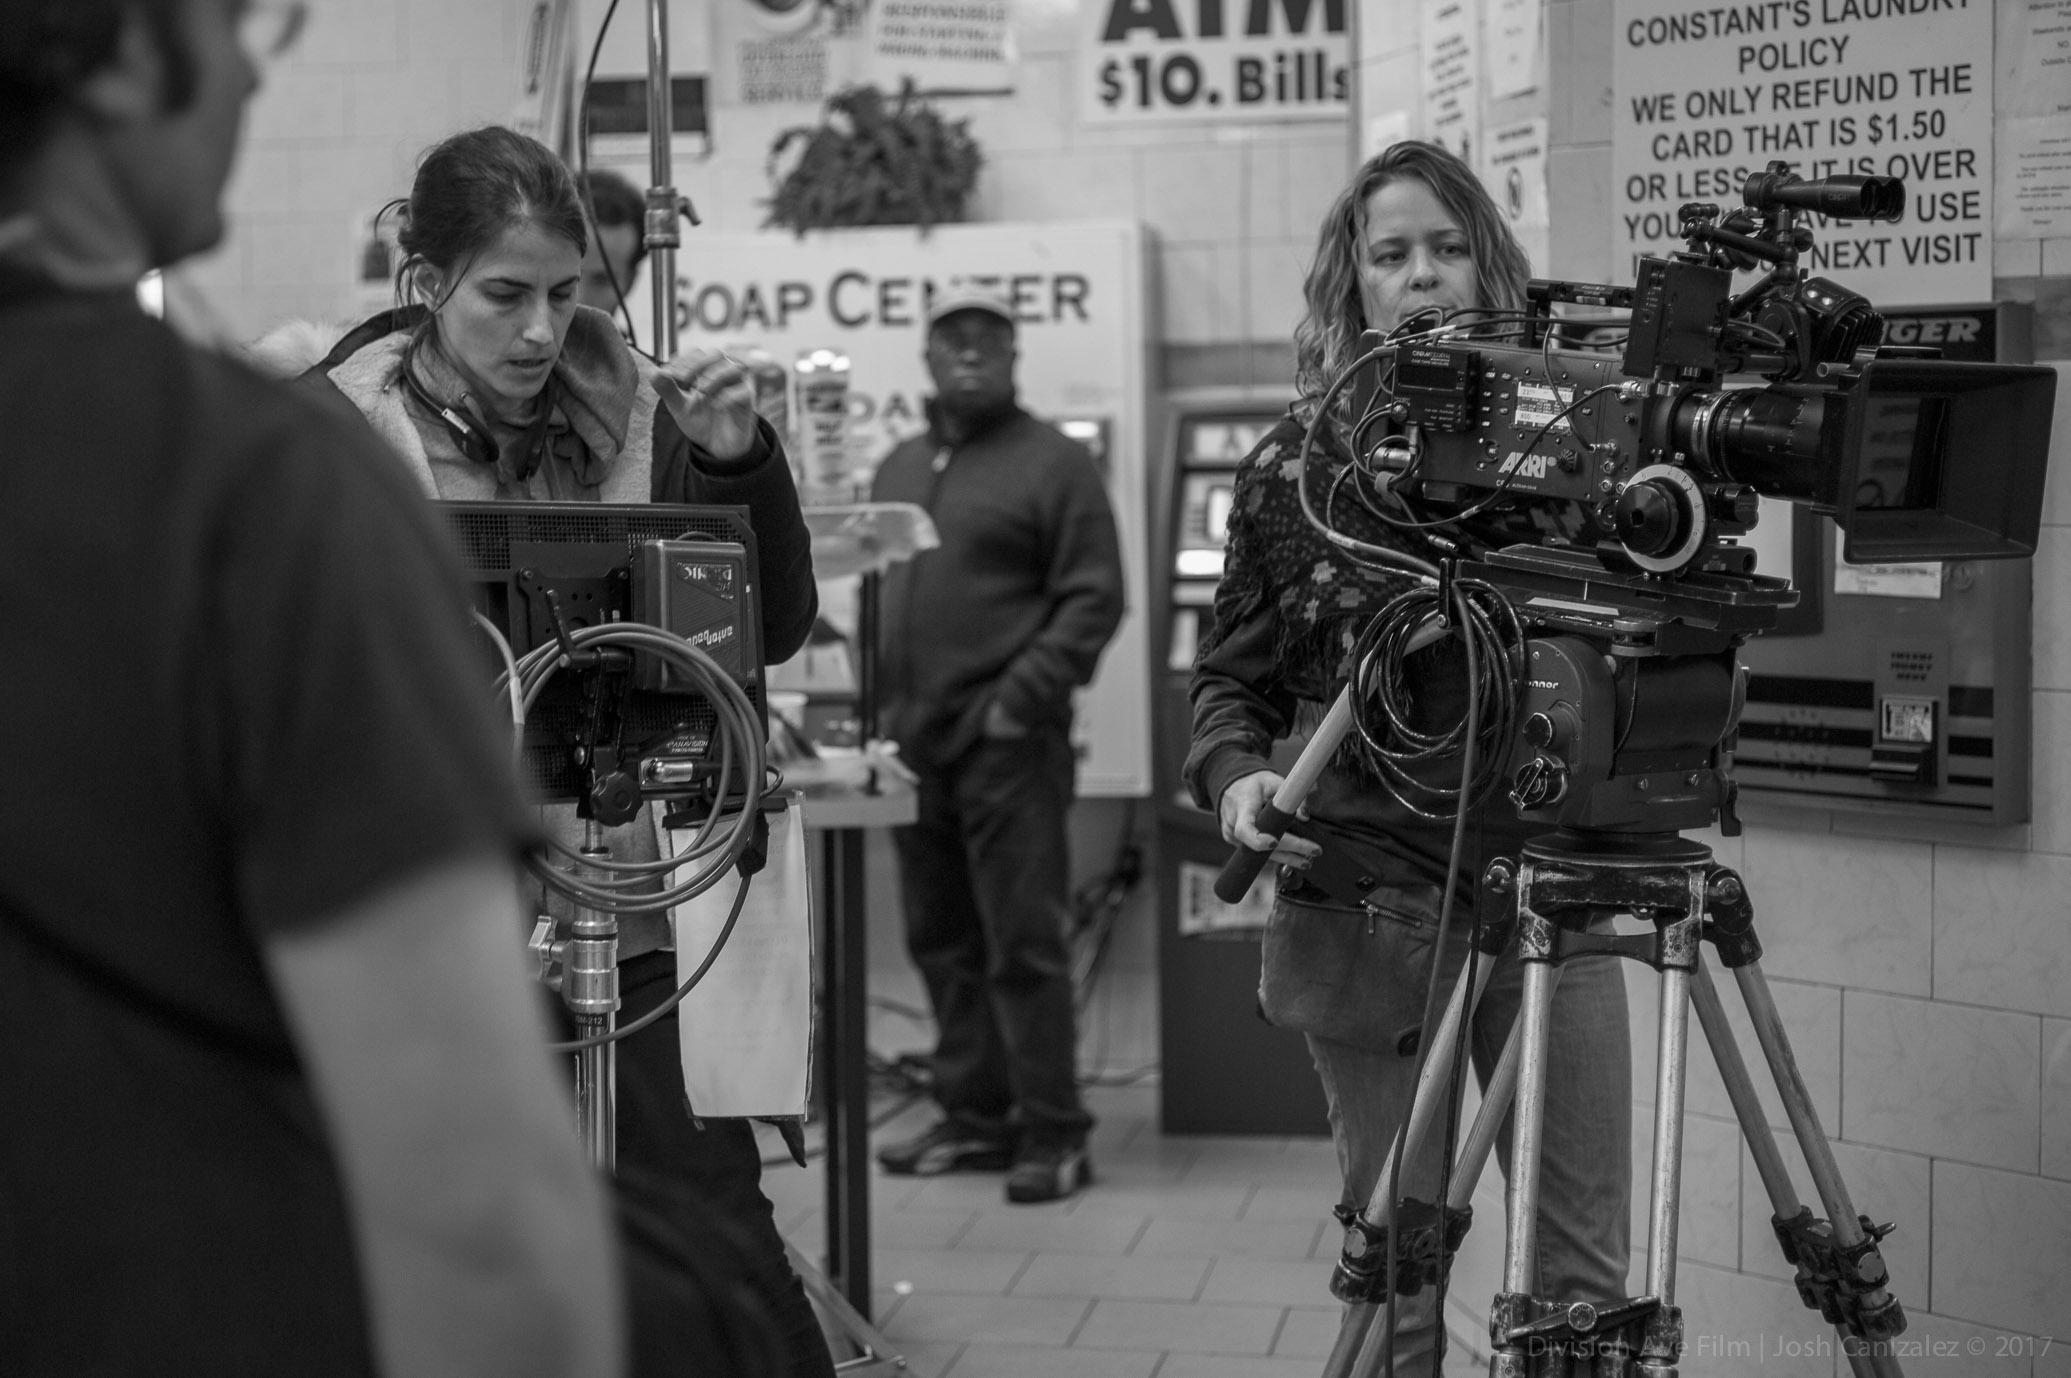 Director Tamar Glezerman and cinematographer Meg Kettell